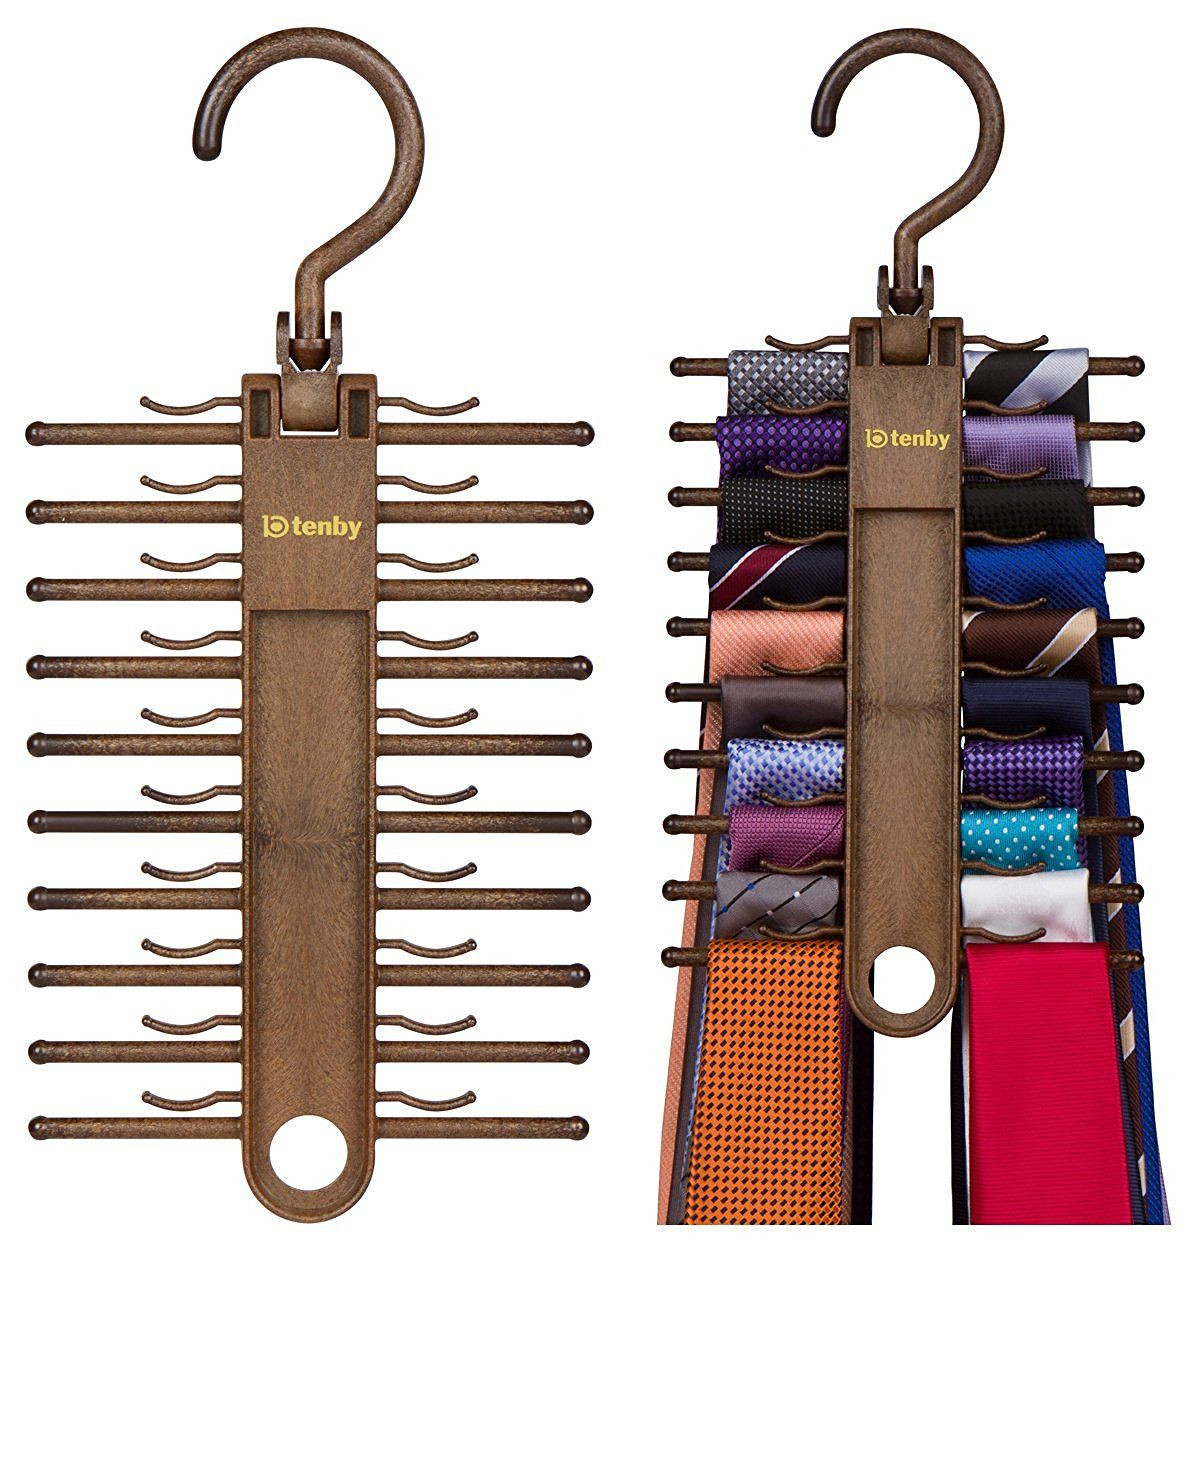 Hook Home /& Living Hanger Holder Storage Rack Closet Organizer Clothes Hanger